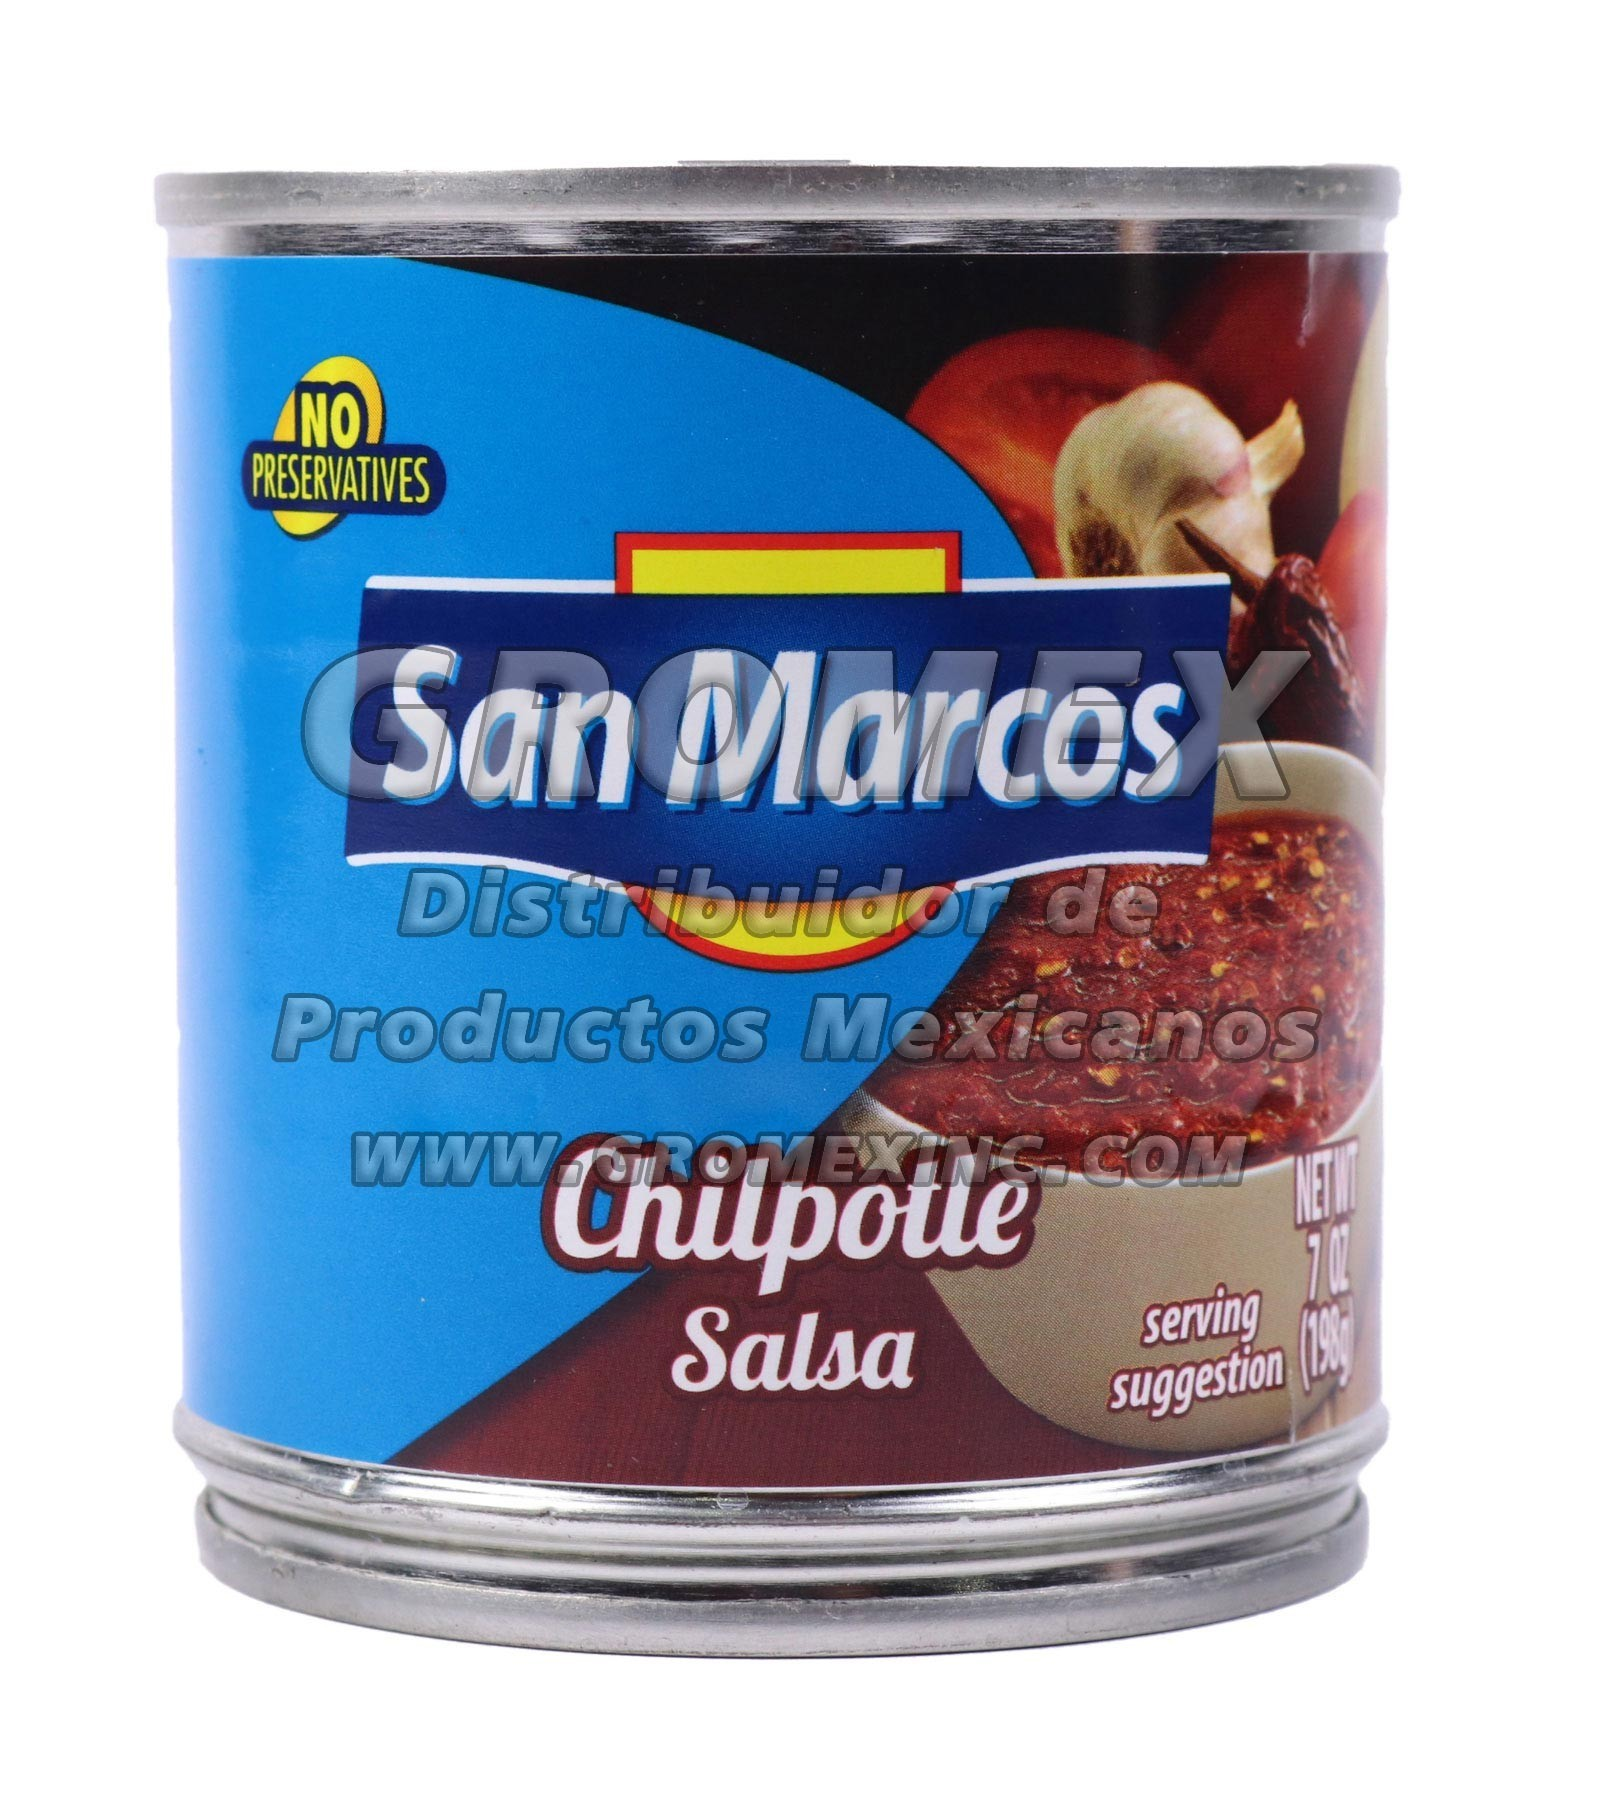 San Marcos Salsa Chipotle 24/7 oz - GROMEX